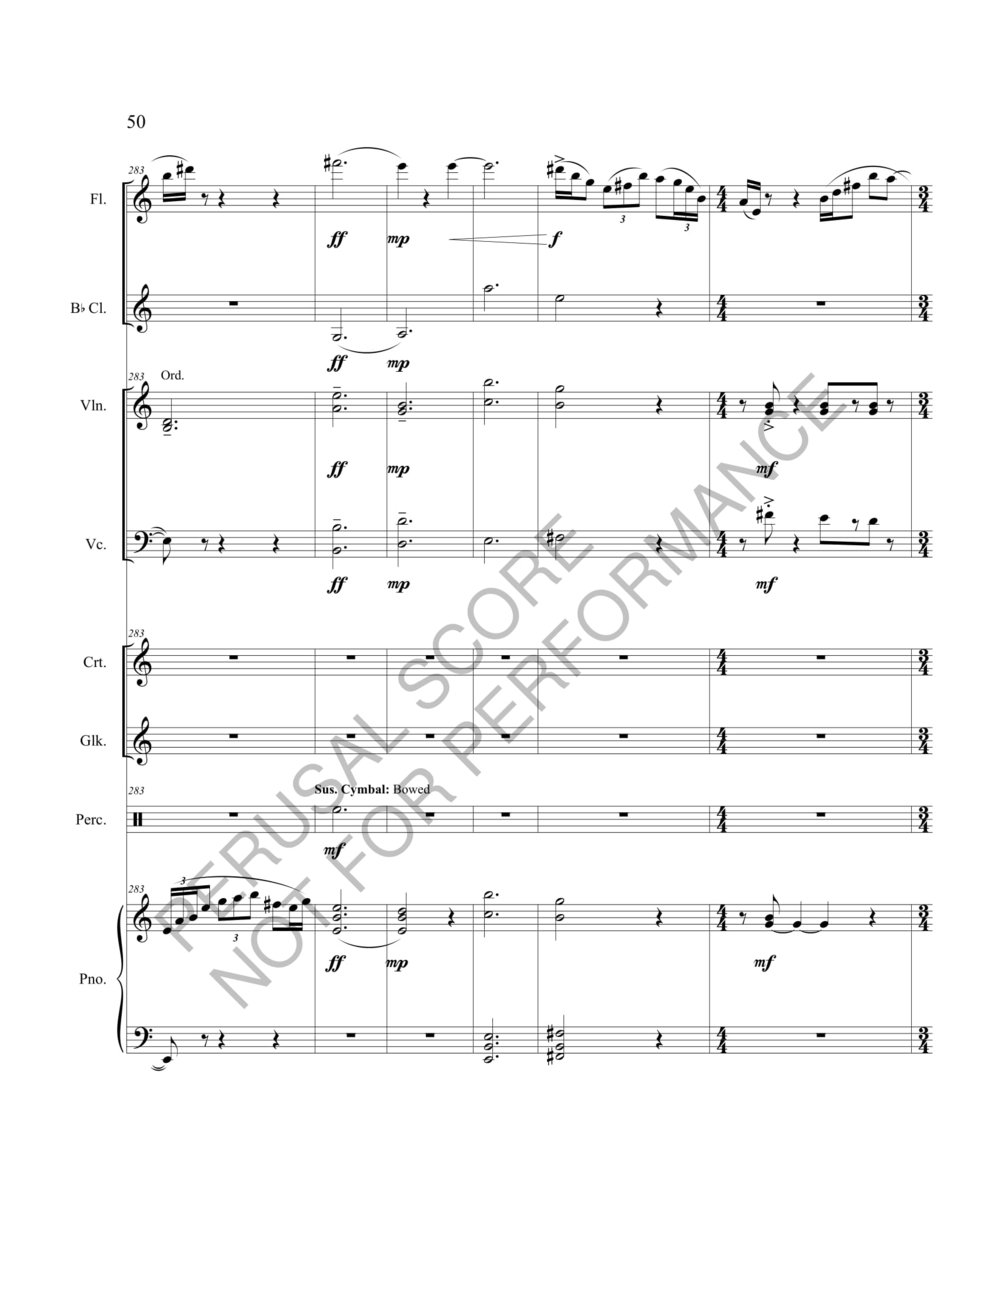 Boyd Terra Liberi Score-watermark-56.jpg